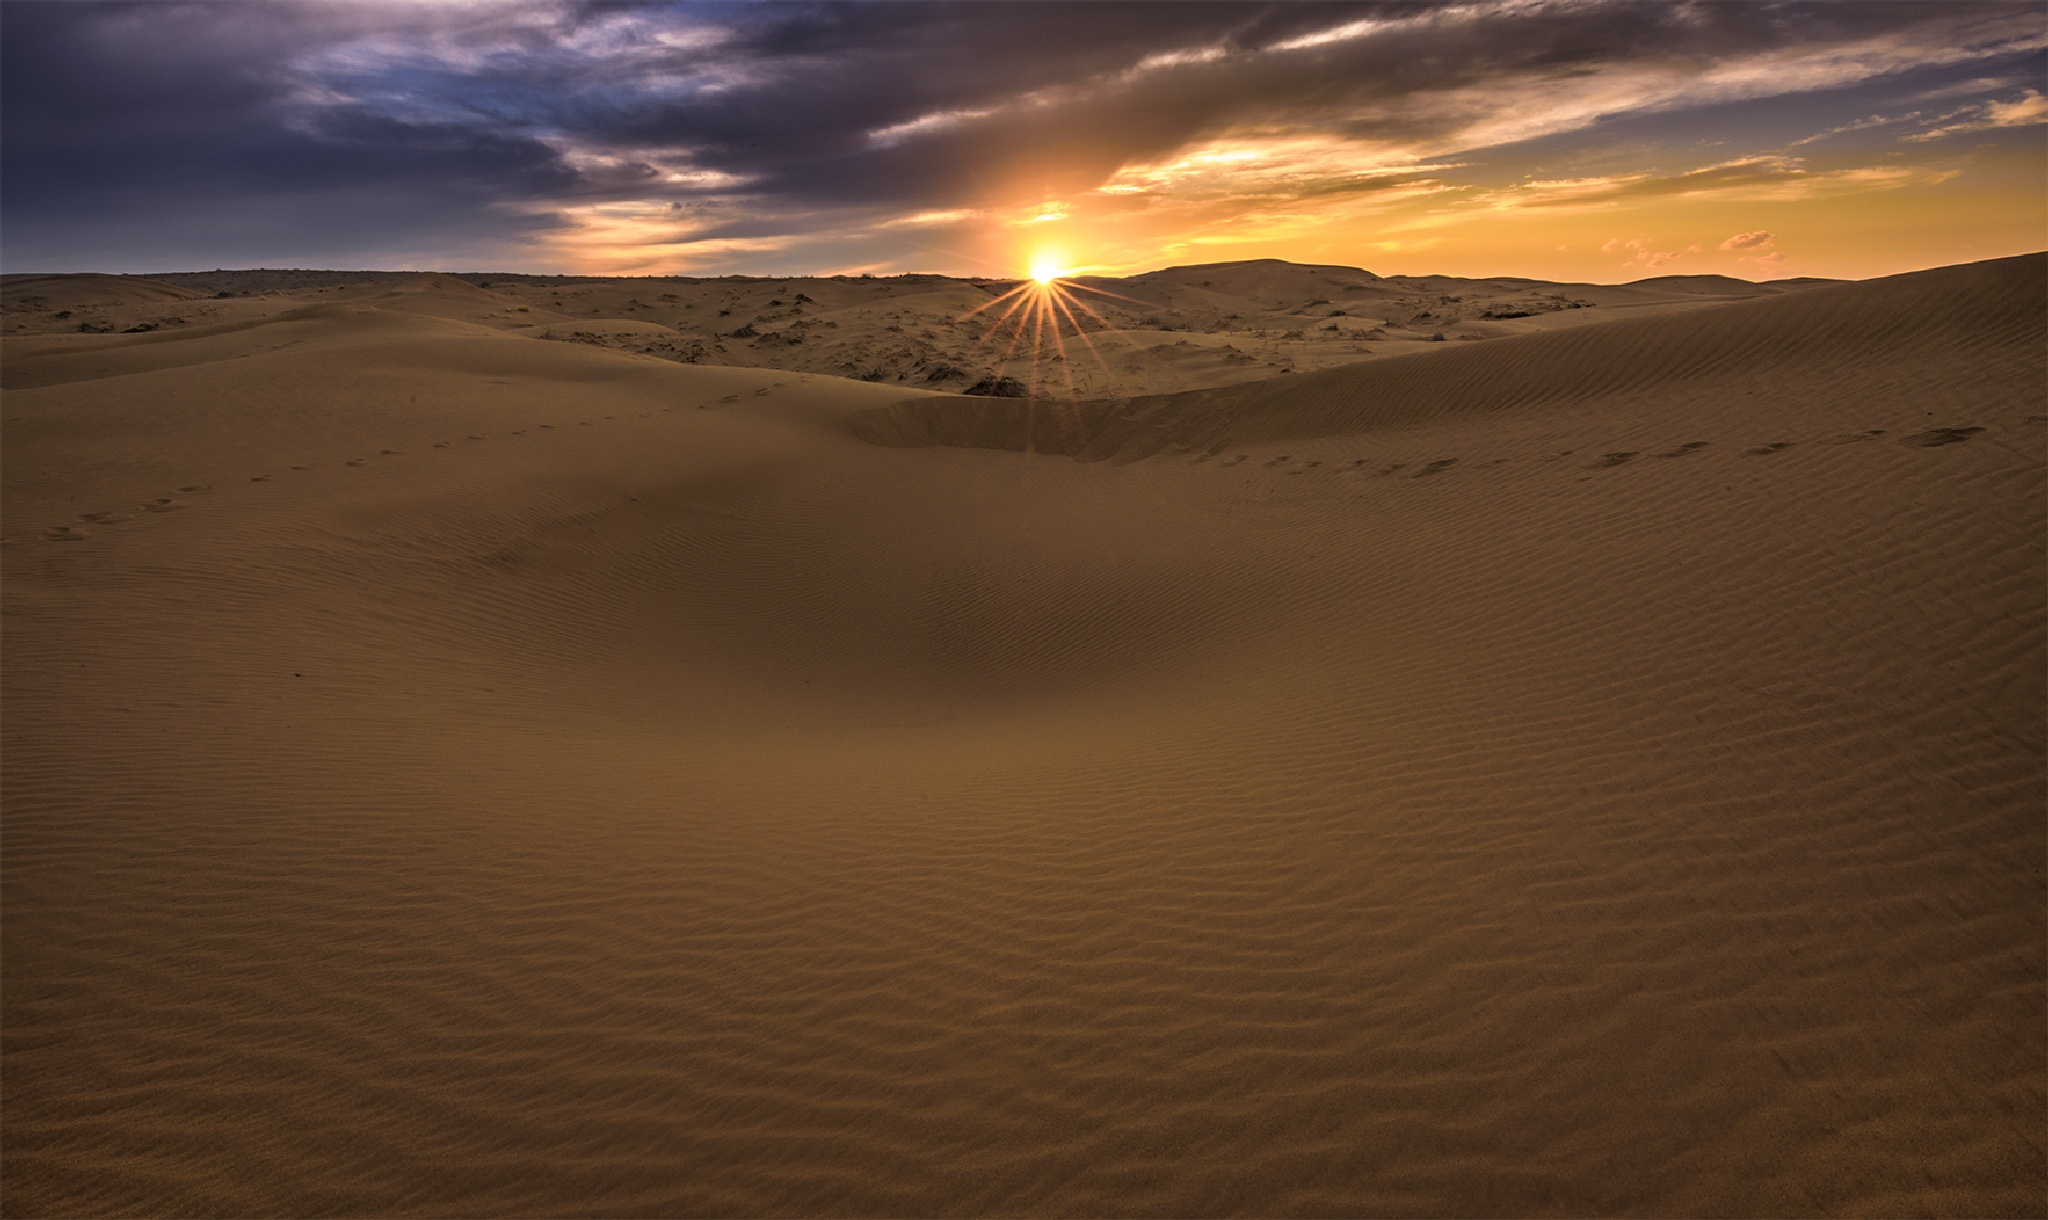 Iran / Desert Maranjab   by Saeed Mohammadzadeh